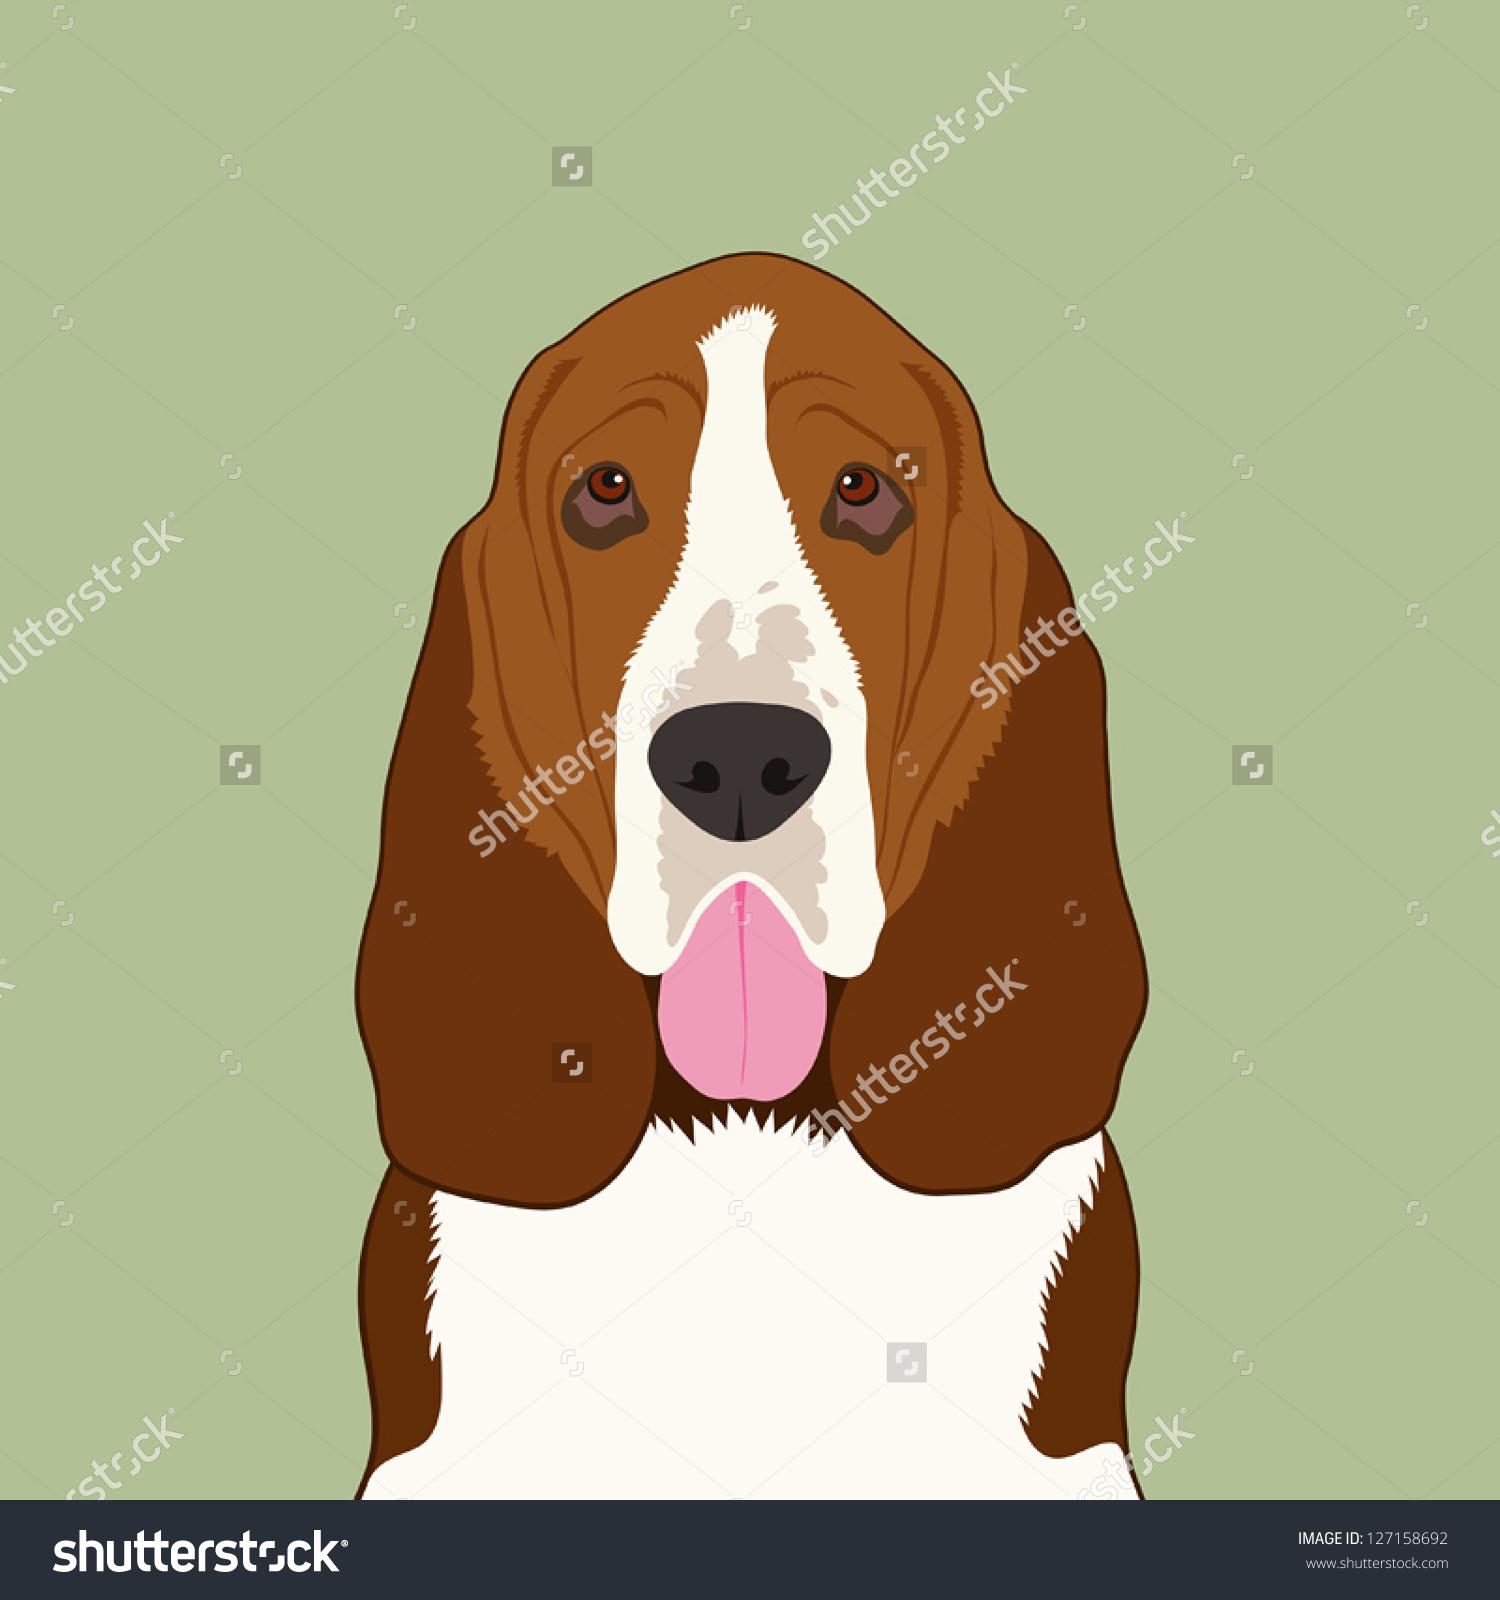 Buddy the dog clipart. Clipartfest basset hound